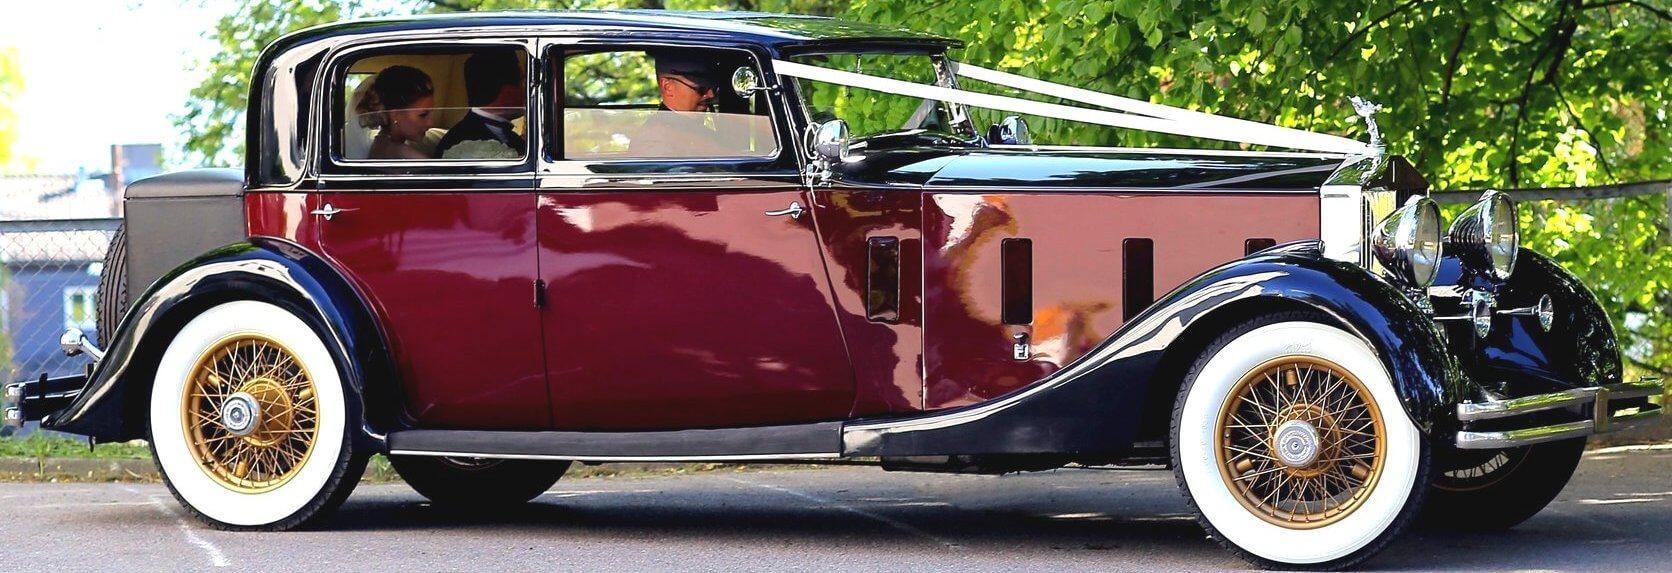 Rolls-Royce Phantom veteranbil klar for bryllupskjøring i Oslo